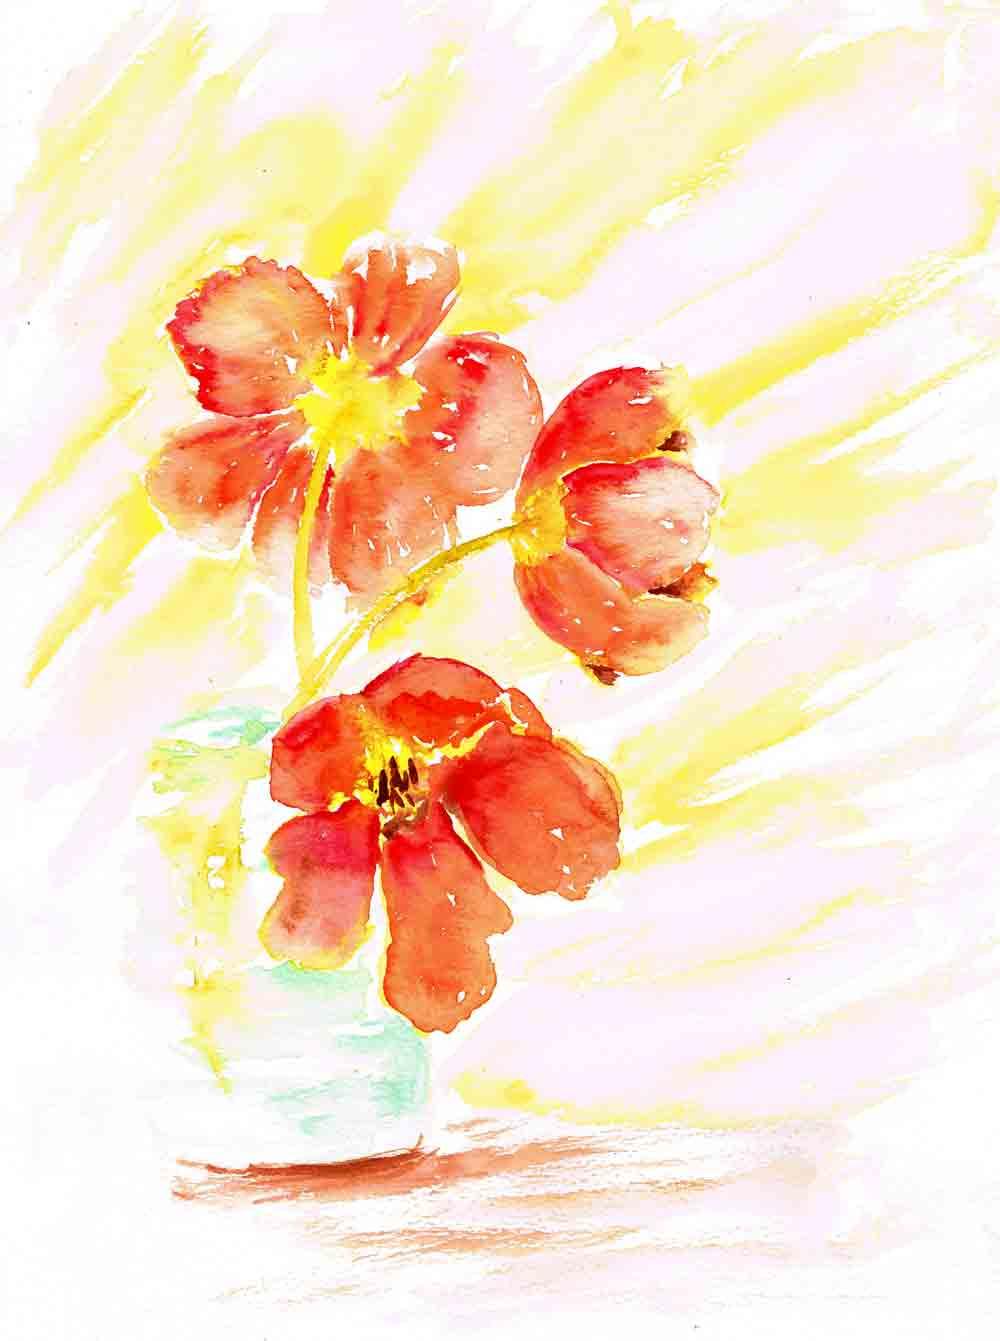 Tulips-no-4-trio-yellow-background-kw.jpg